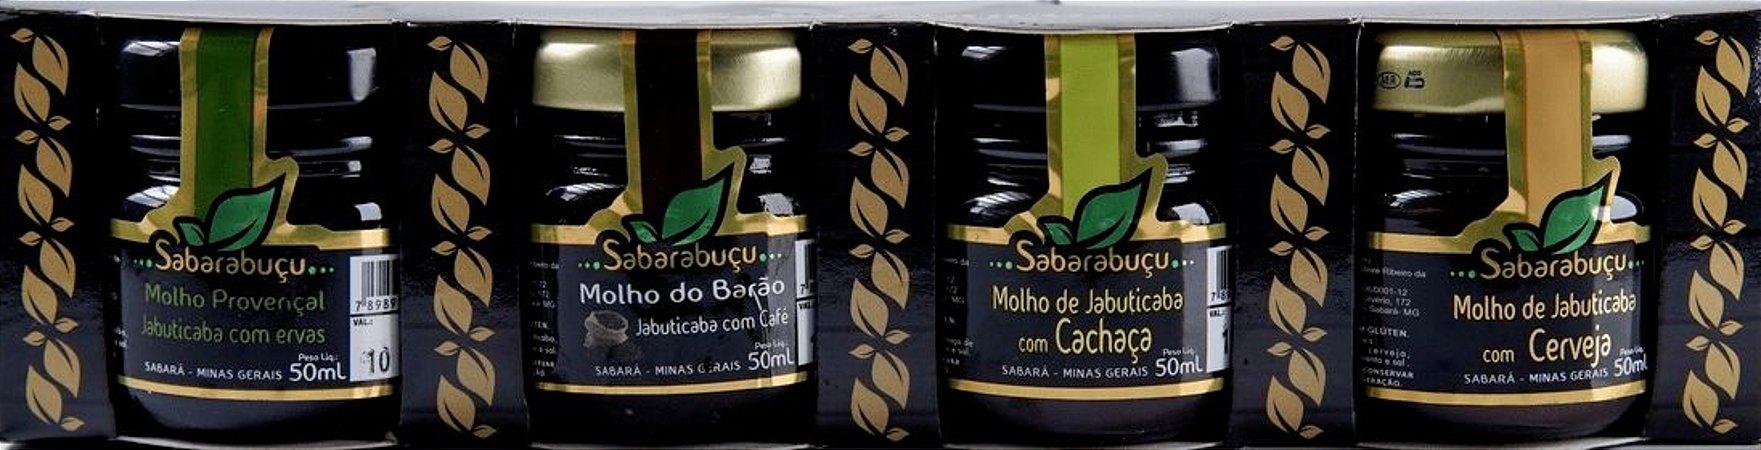 Kit de molhos de Jabuticaba - Sabarabuçu - 200ml